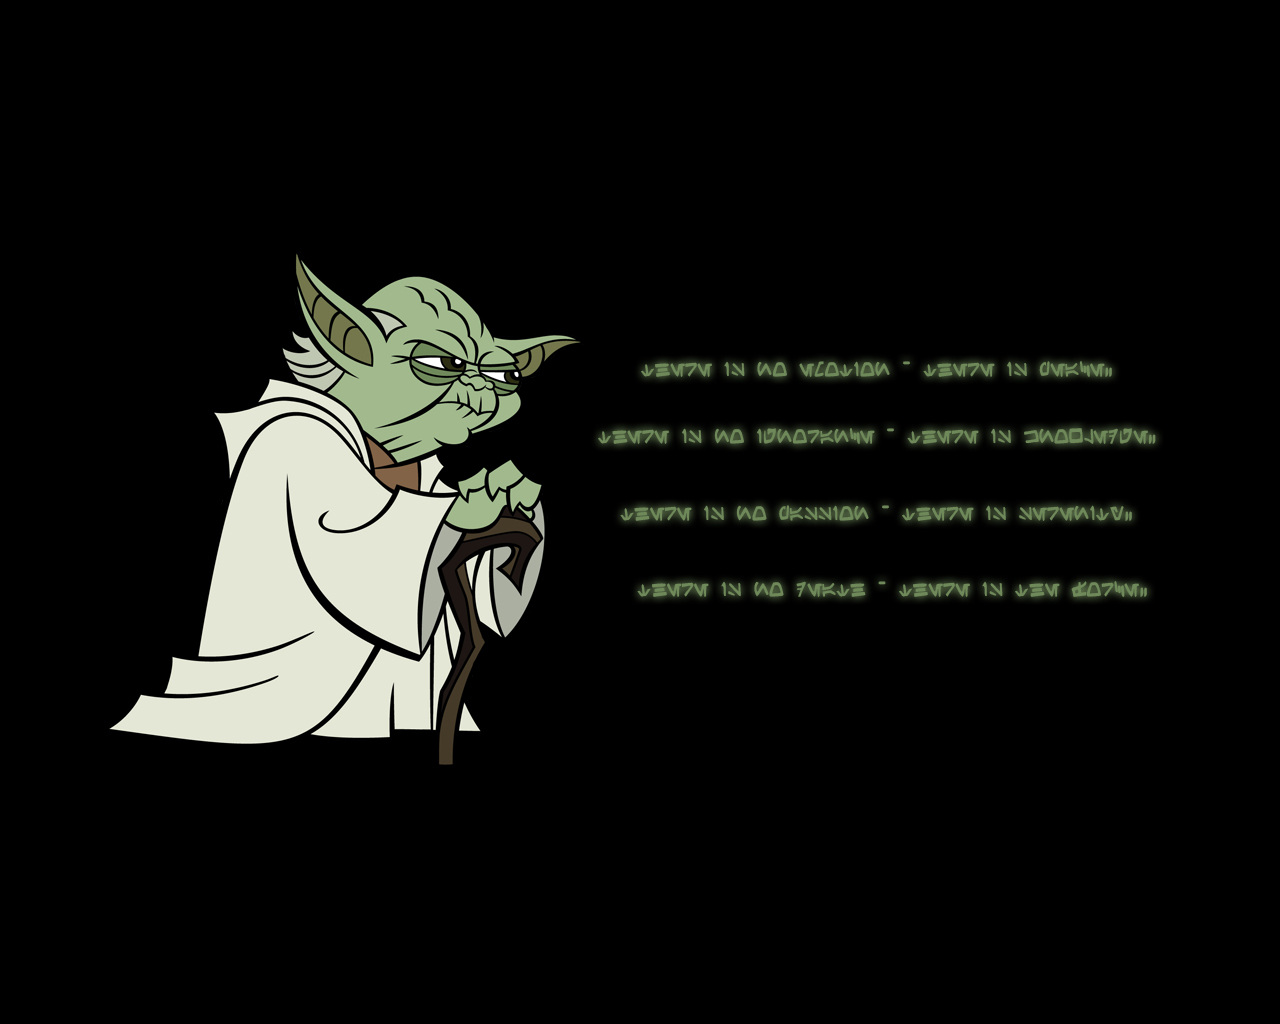 Jedi Code screenshot by 9mmBMF